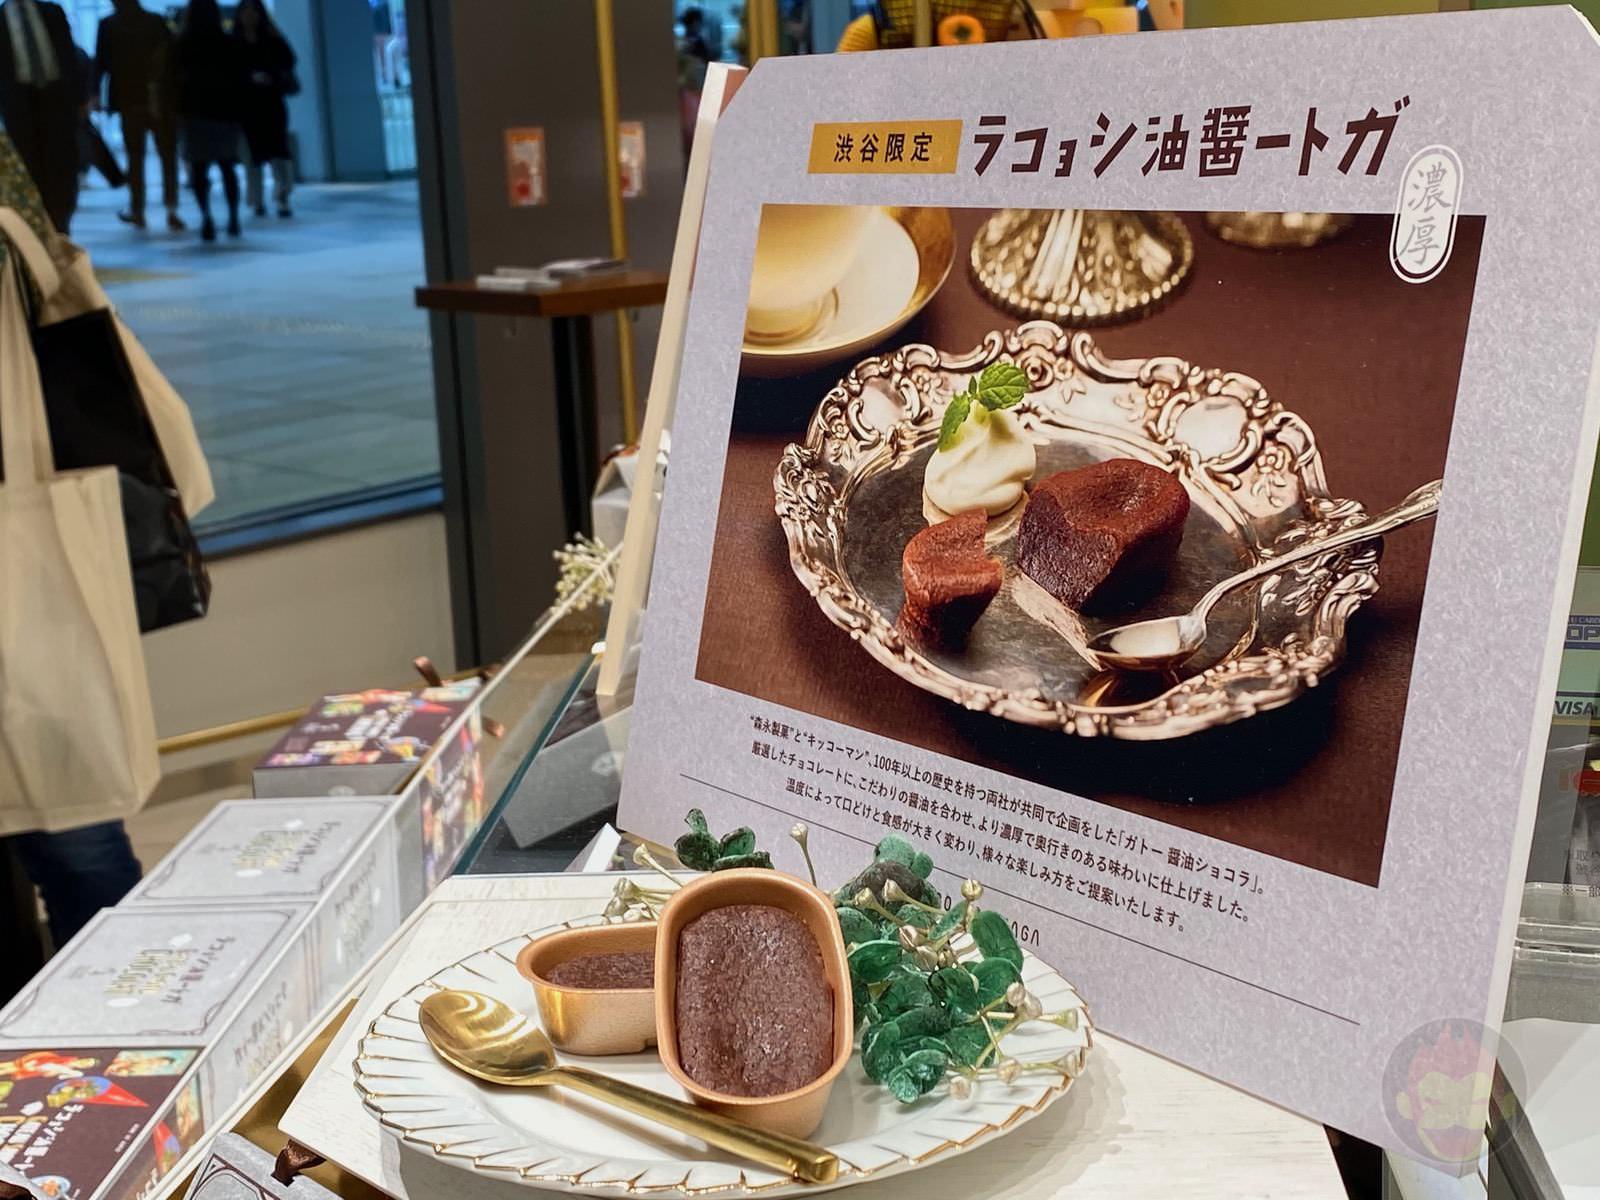 Shibuya-Scramble-Square-Food-I-Ate-53.jpeg